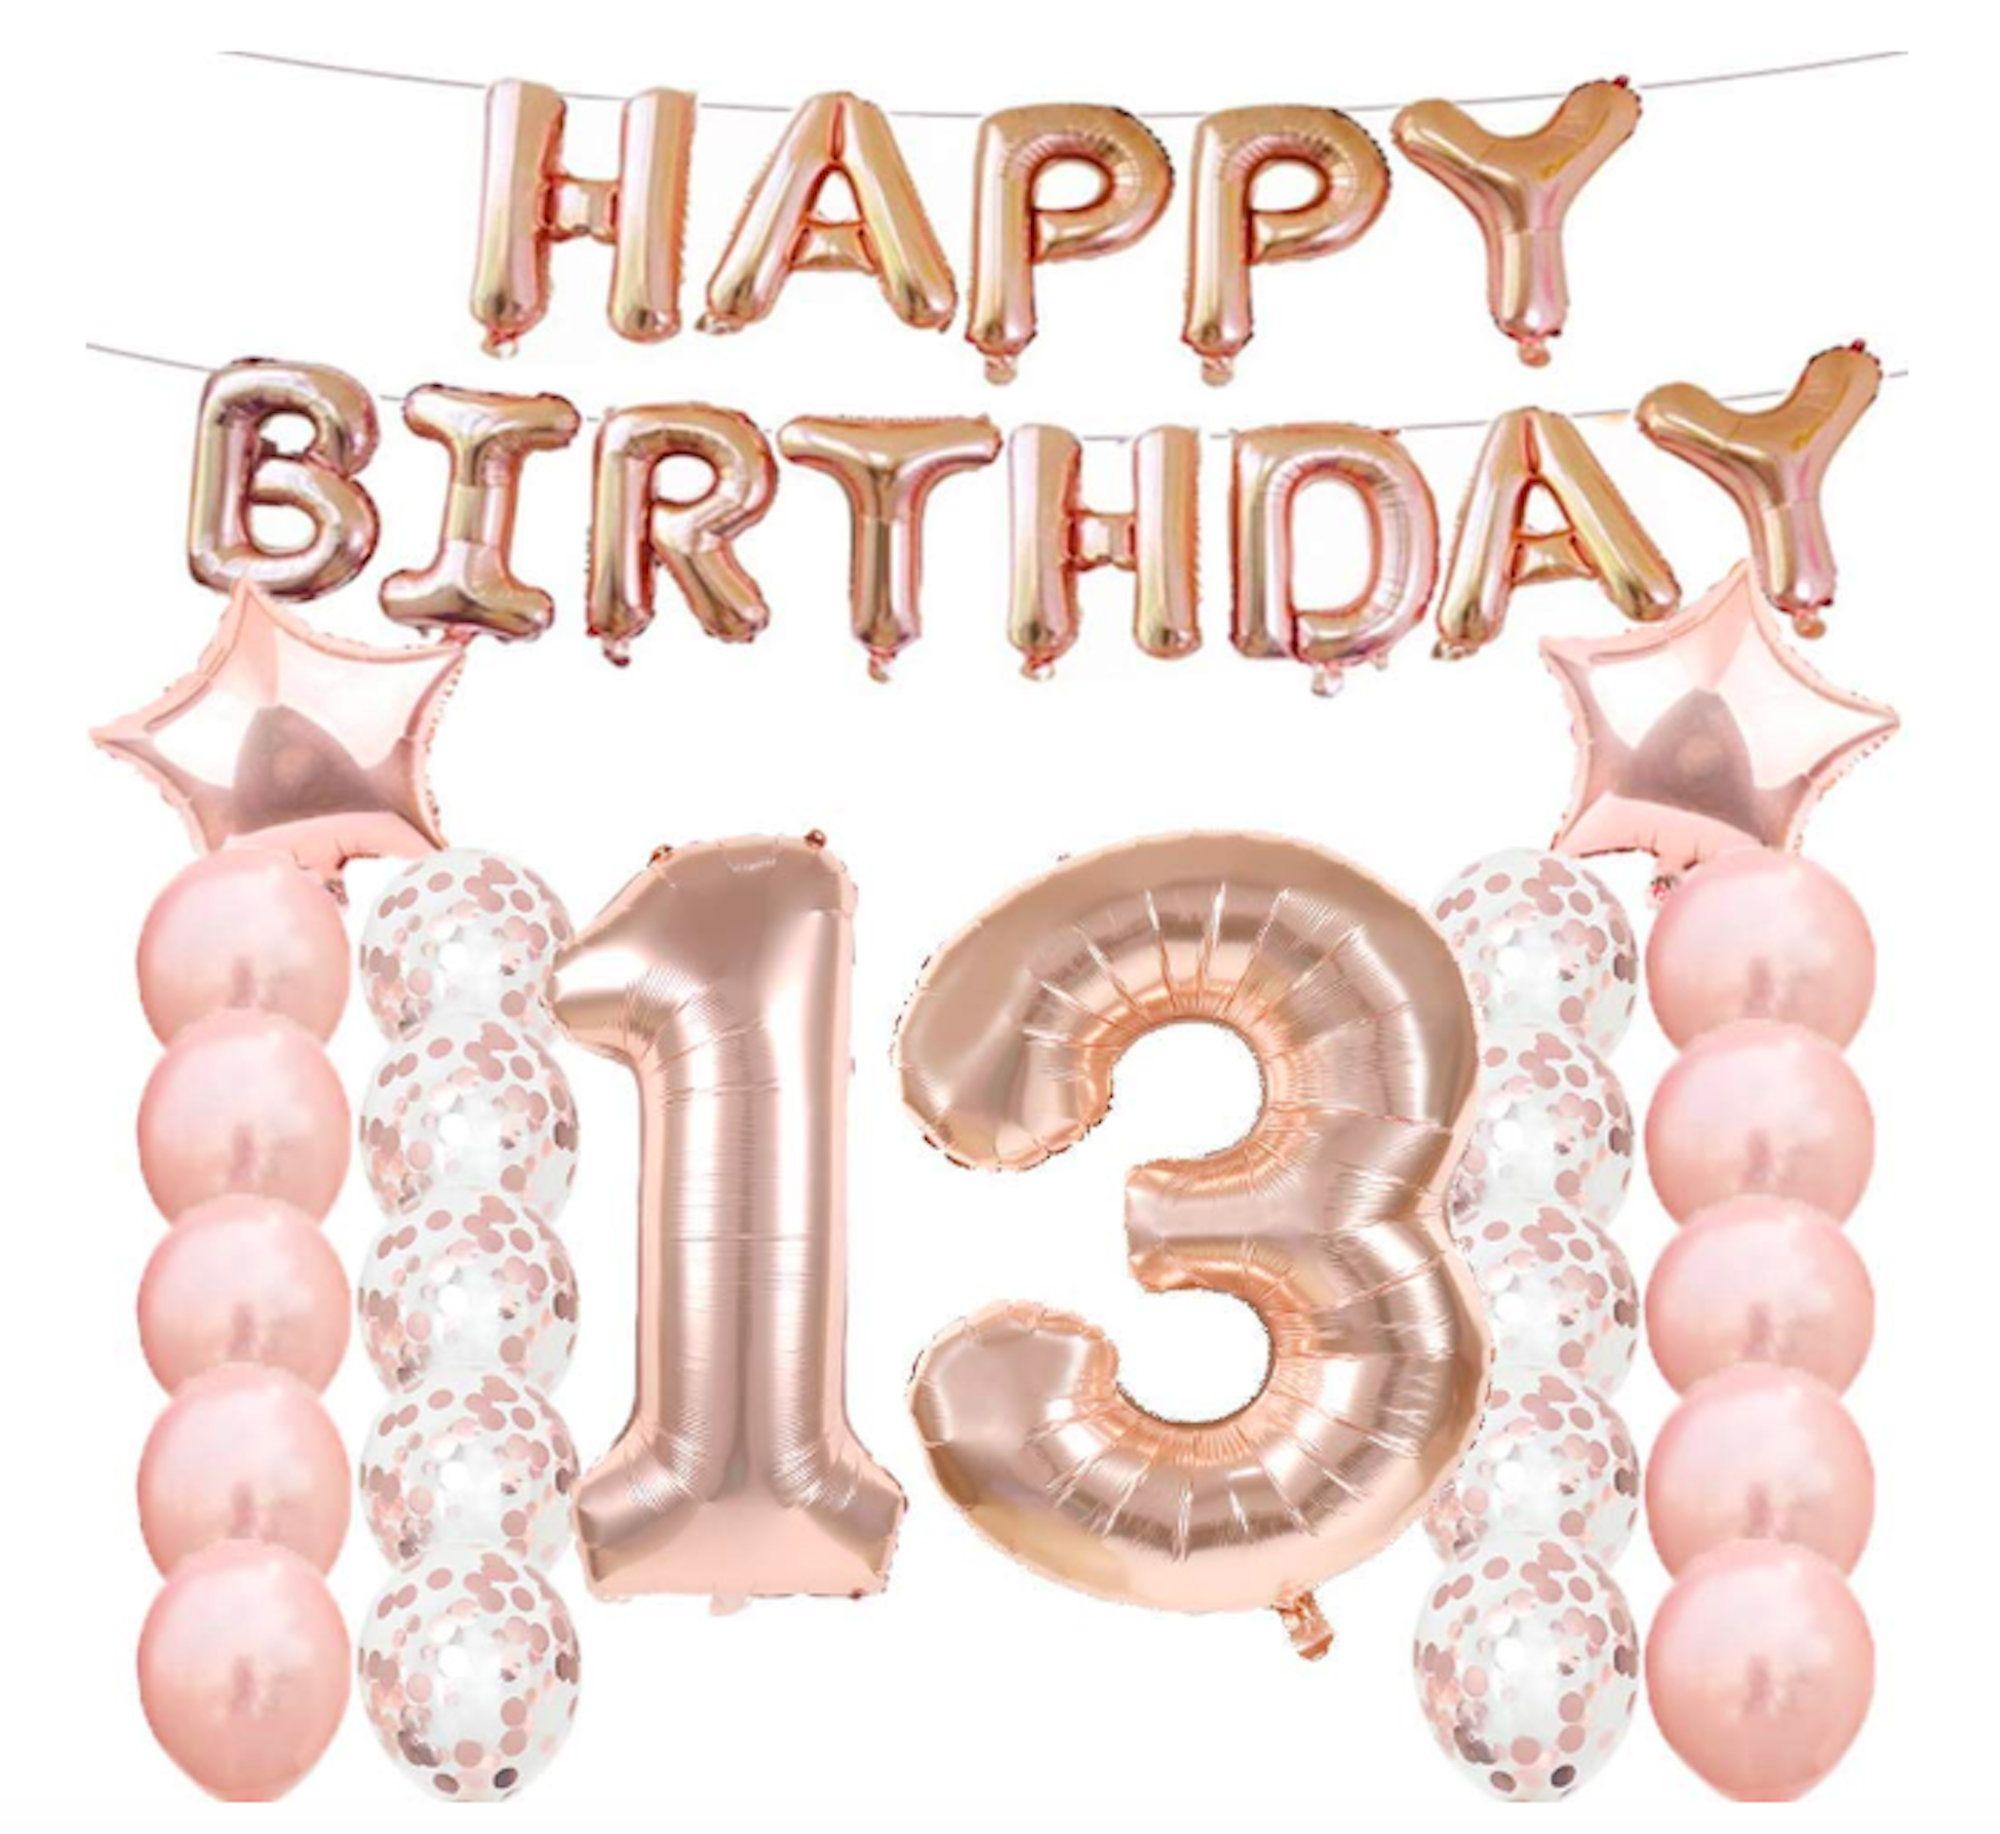 Rose Gold 13th Birthday Decorations 13 Birthday Party Etsy In 2021 Gold Birthday Decorations Birthday Decorations Birthday Party Decorations